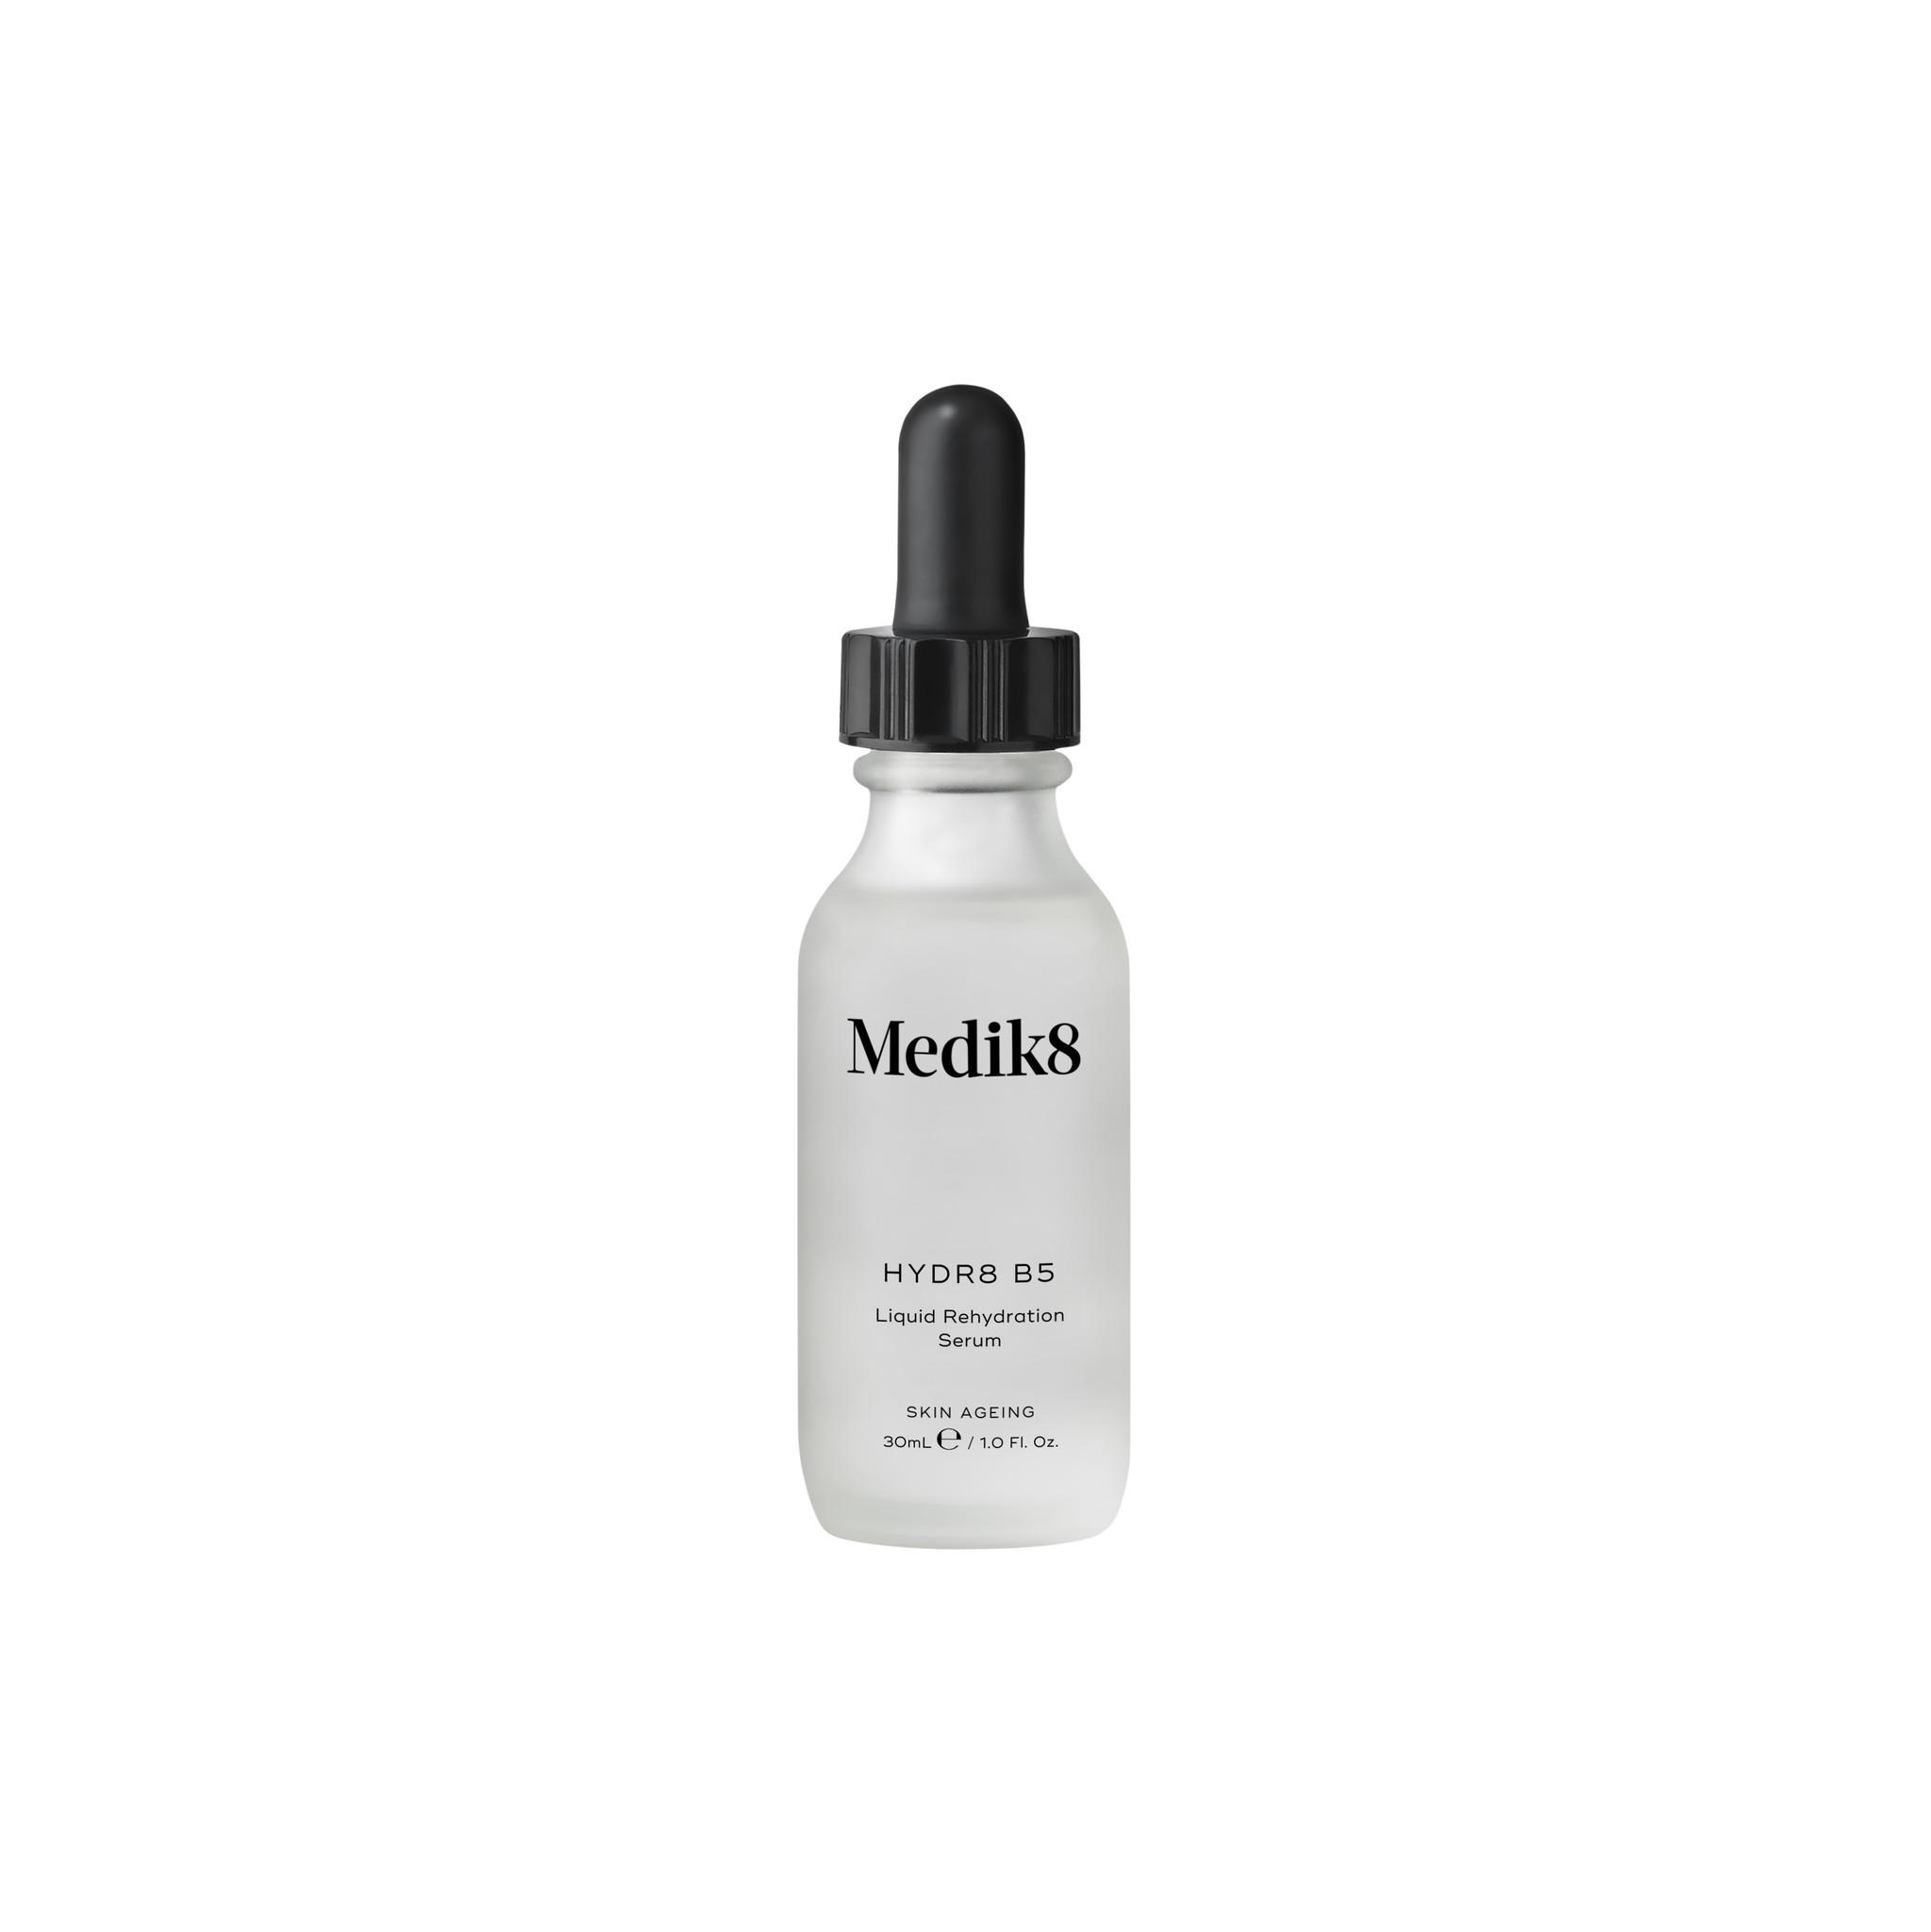 Medik8 Hydra8 B5 | Liquid Rehydration Serum | 30ml